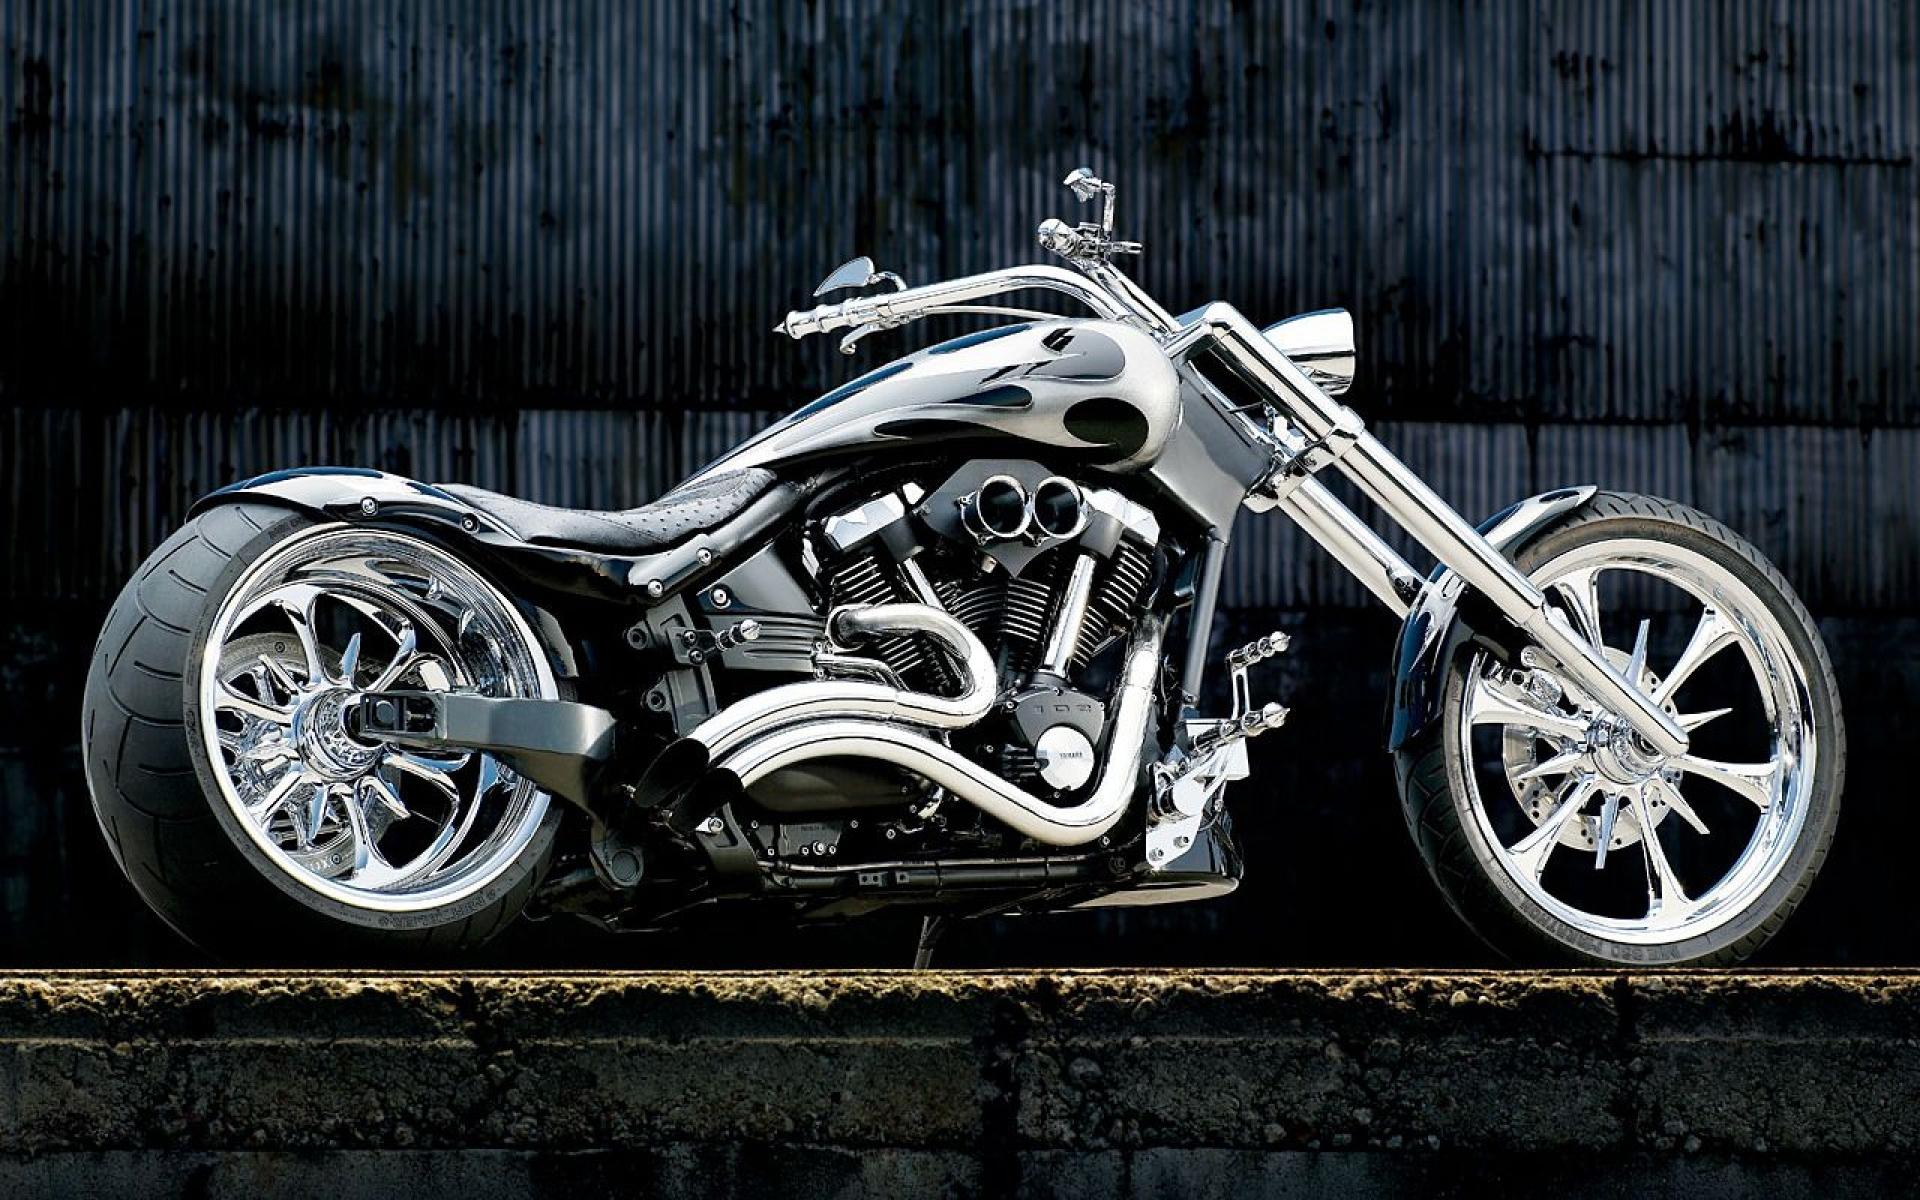 Motorcycle  Wallpapers bestscreenwallpapercom Yamaha Chopper 1920x1200